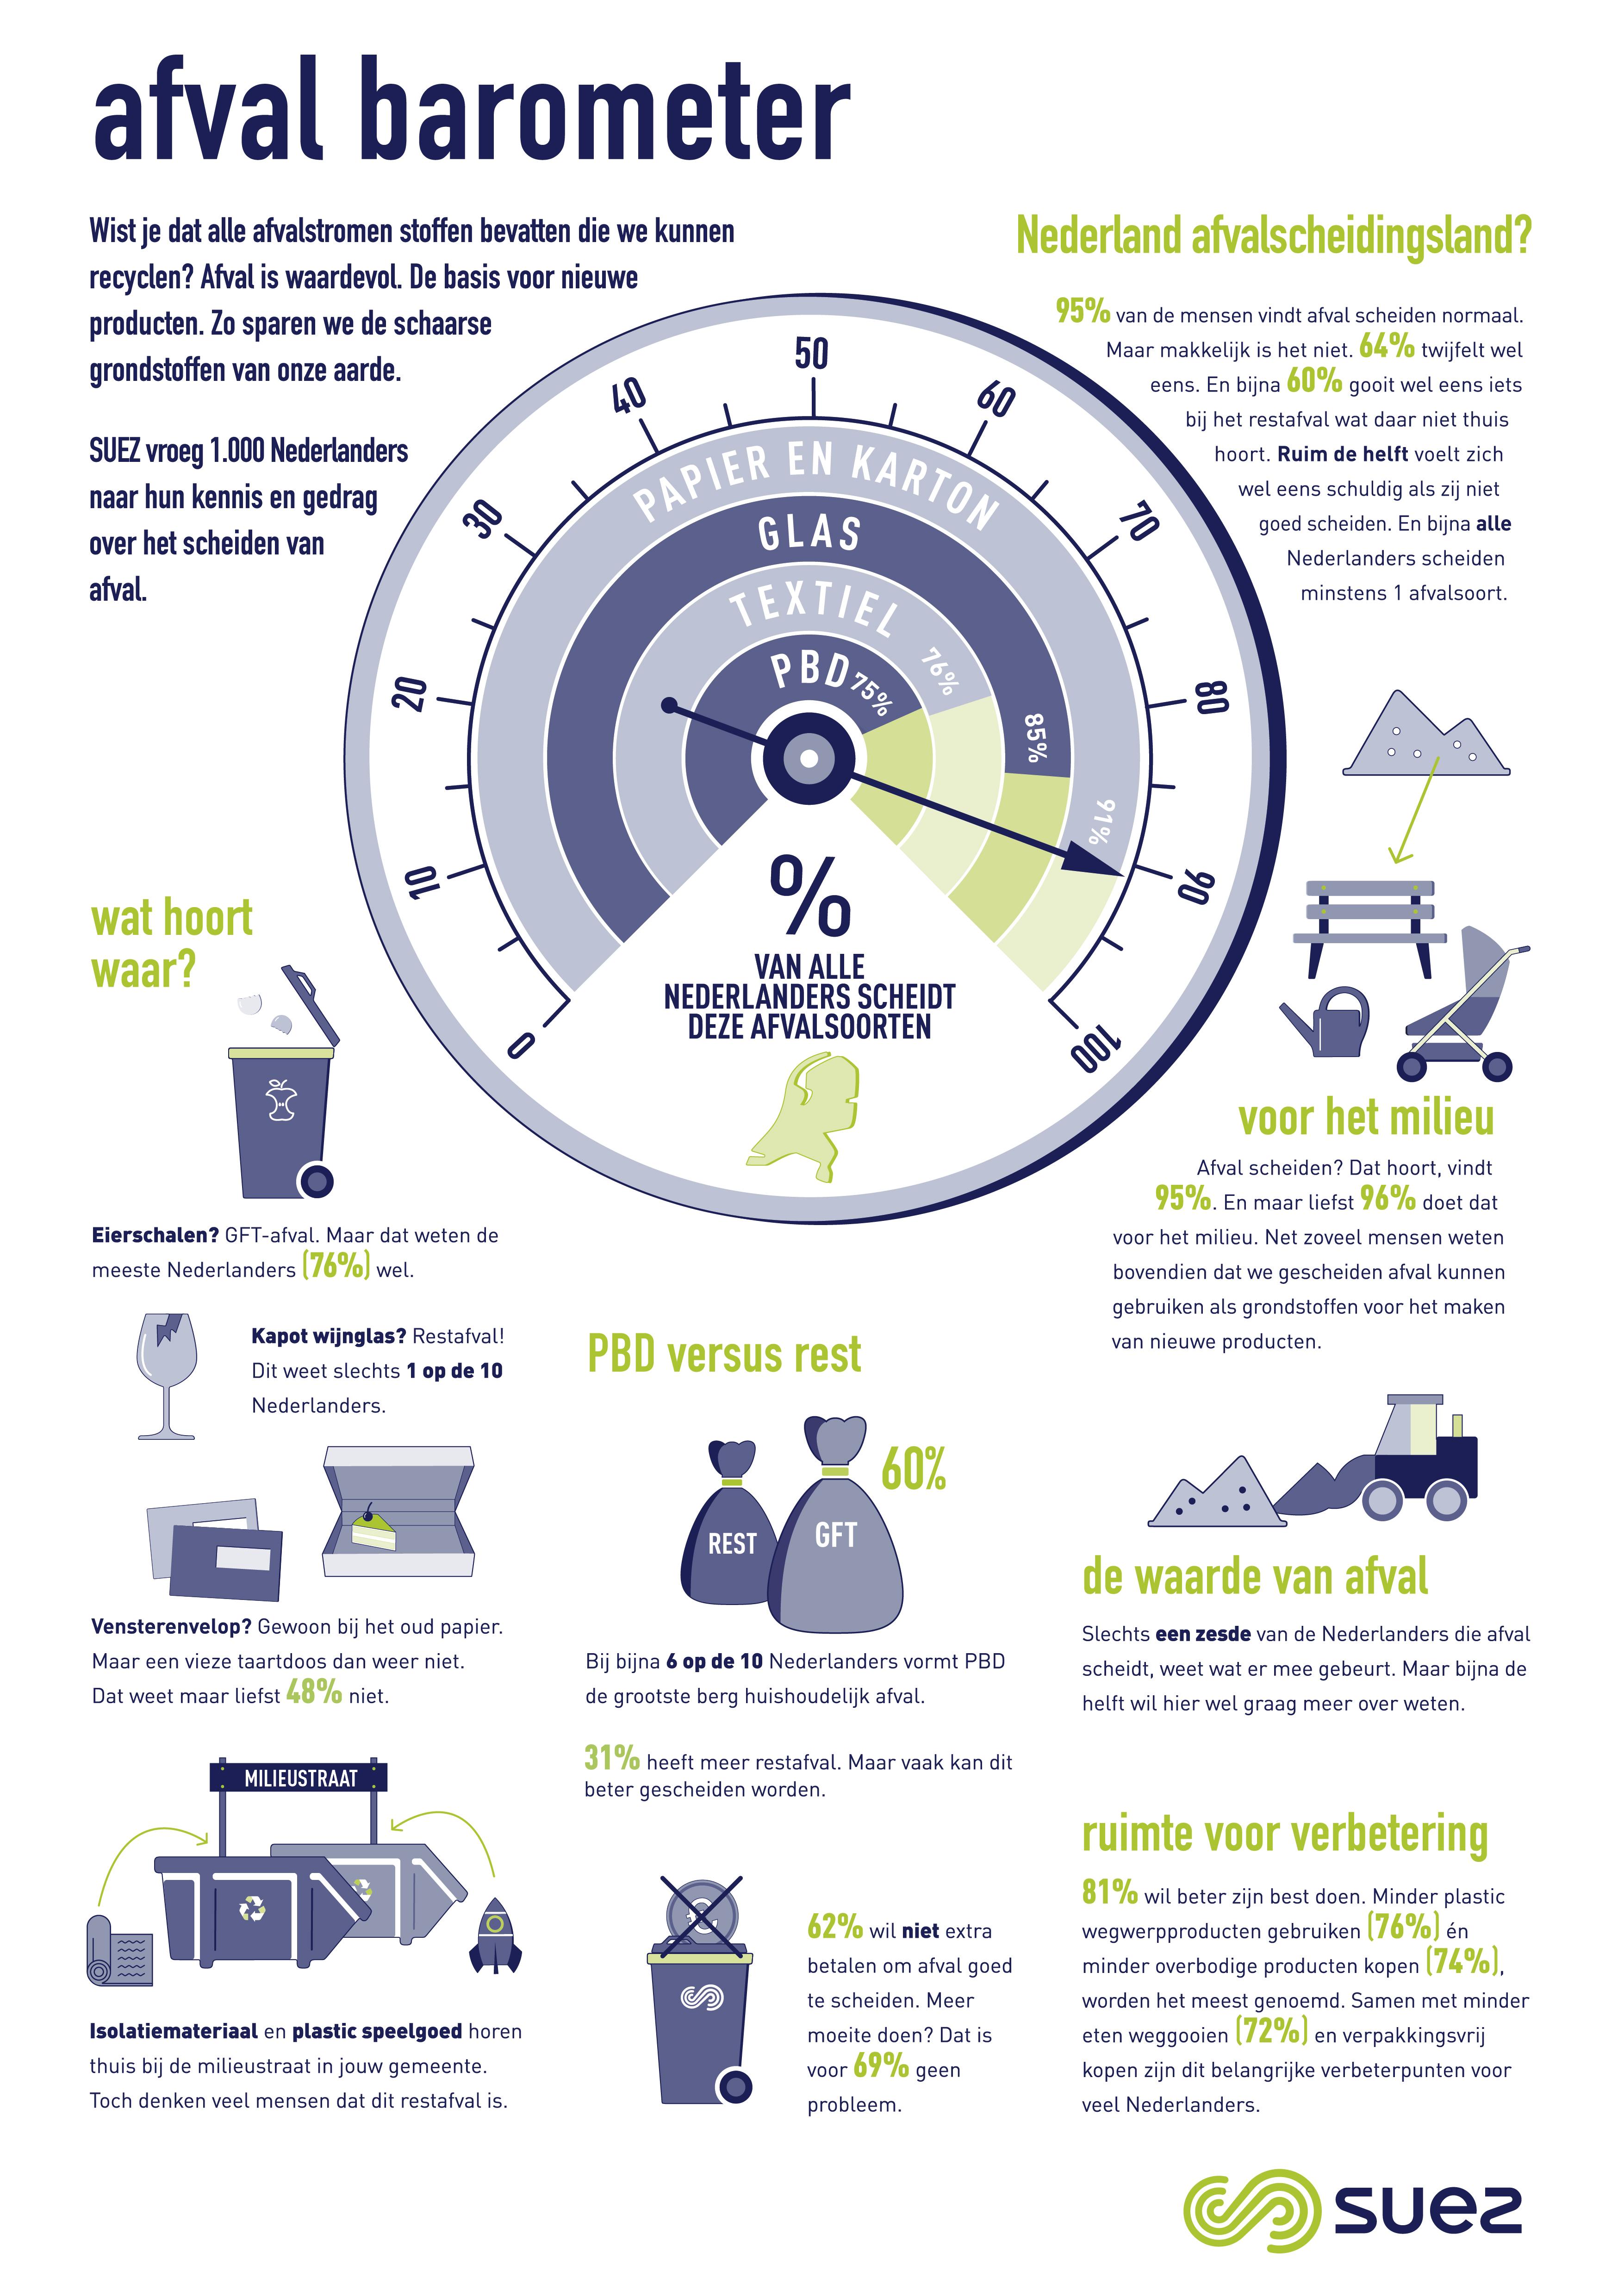 suez afvalscheiden afval barometer